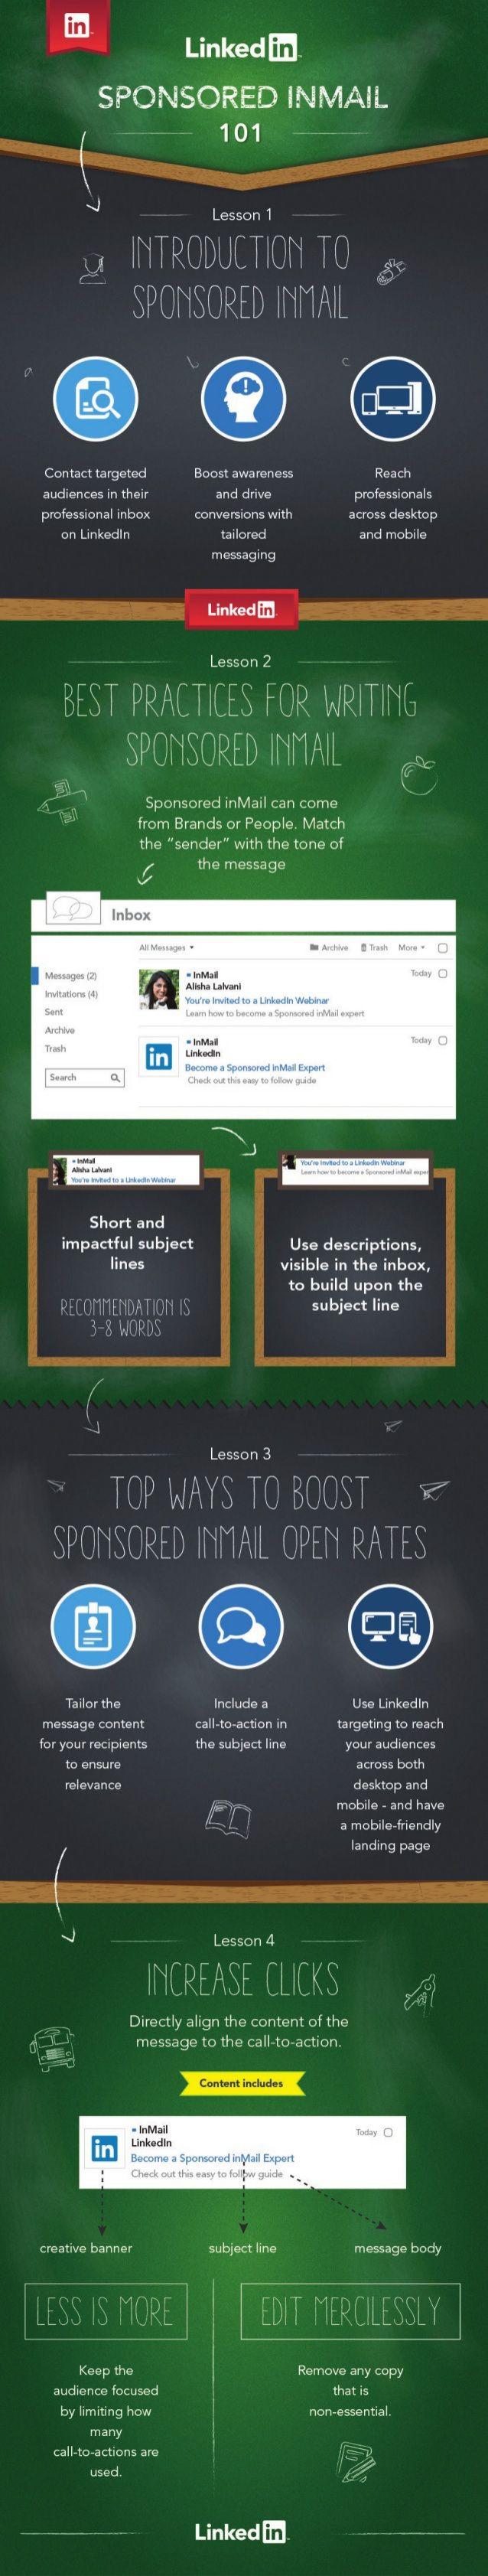 Linkedin sponsored Inmail #linkedin #infographic